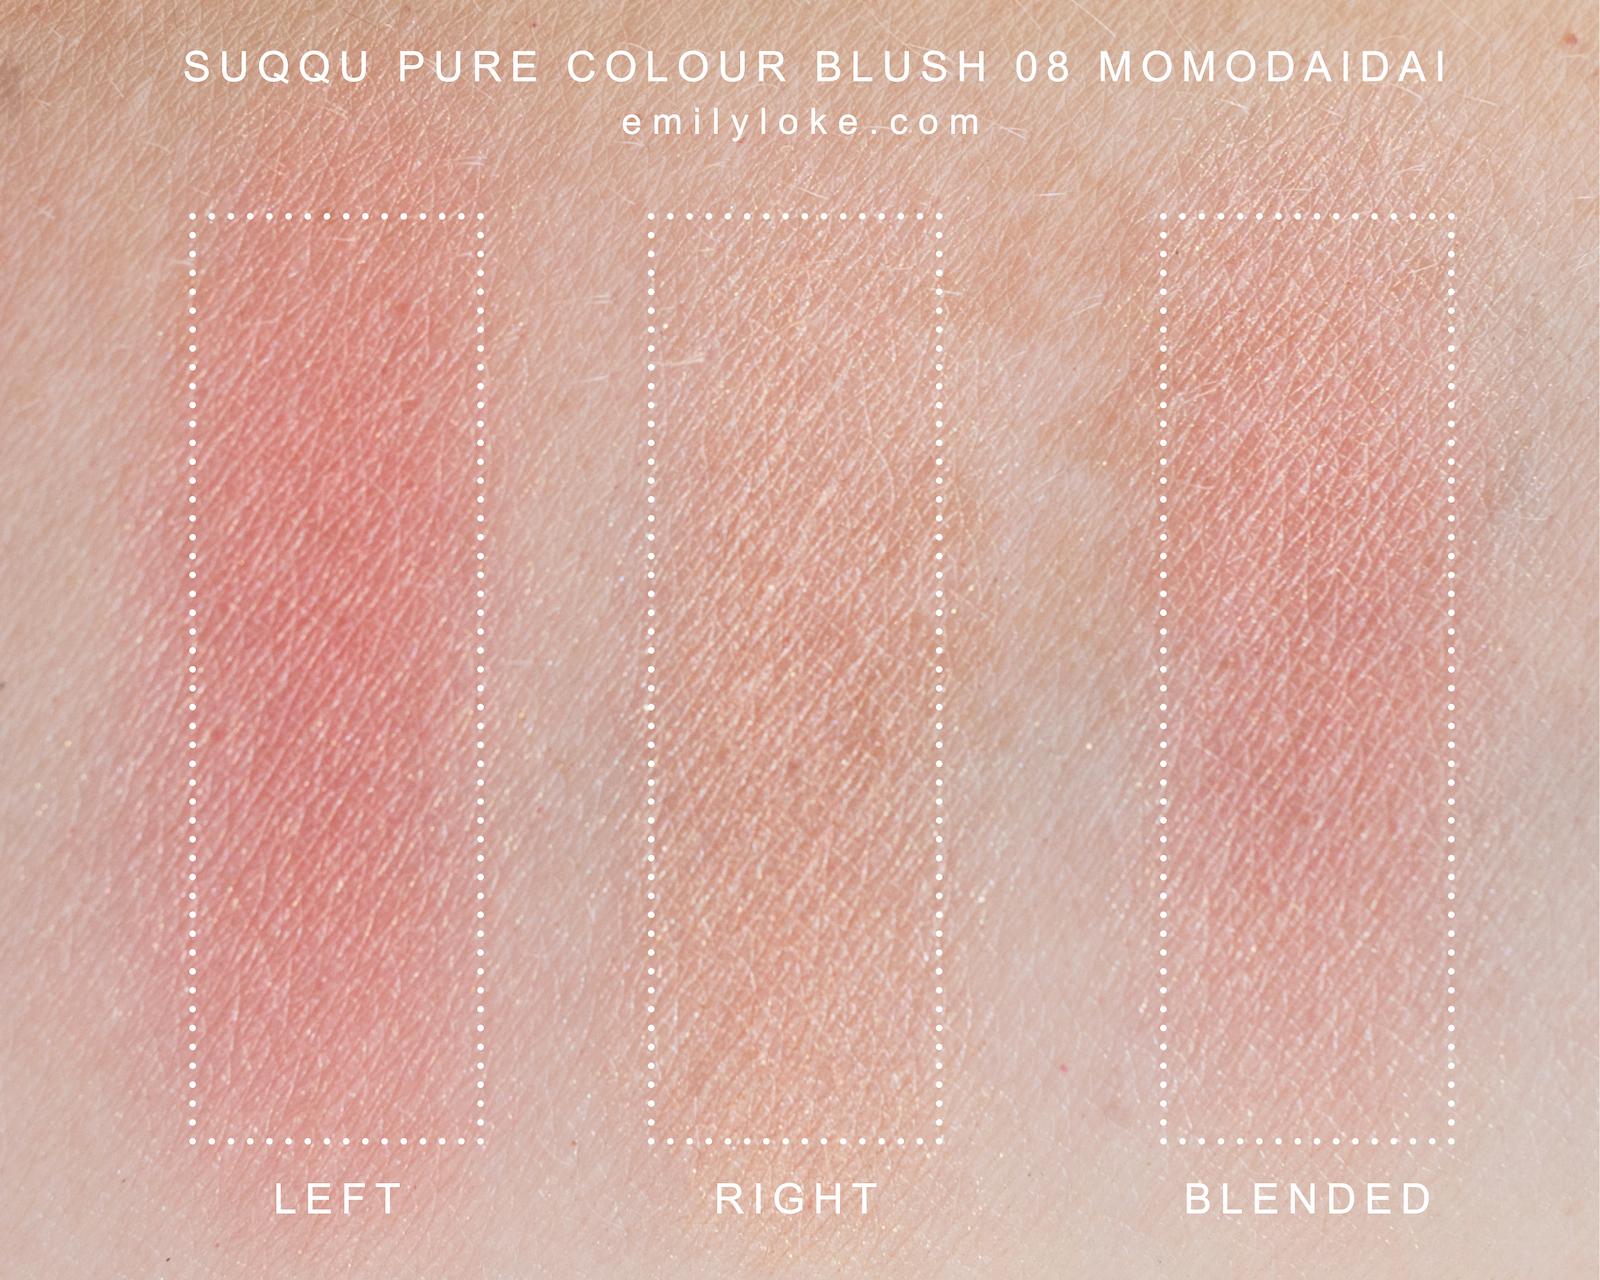 SUQQU blush 08 momodaidai